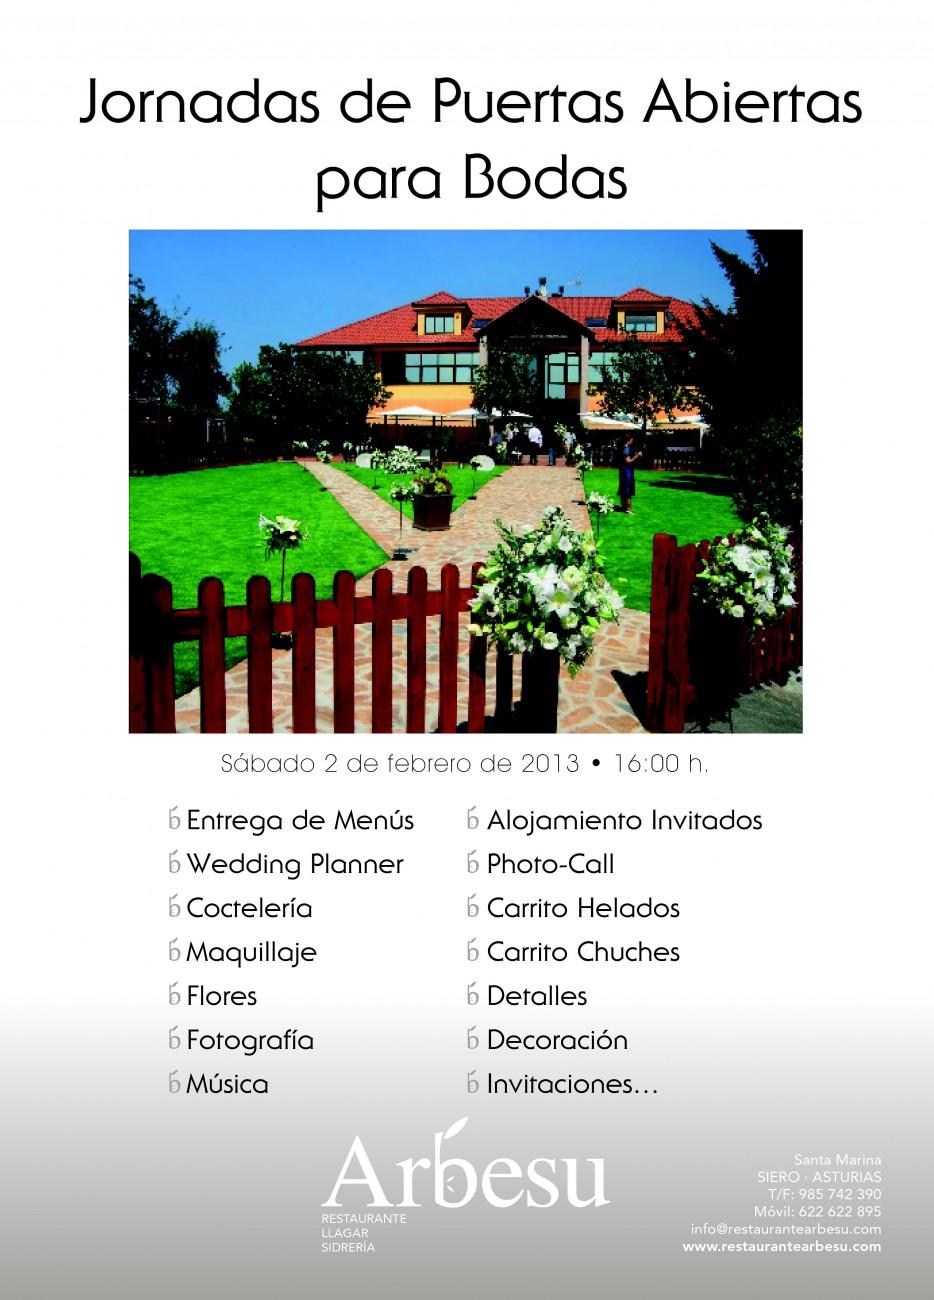 Los Jardines de Arbesú